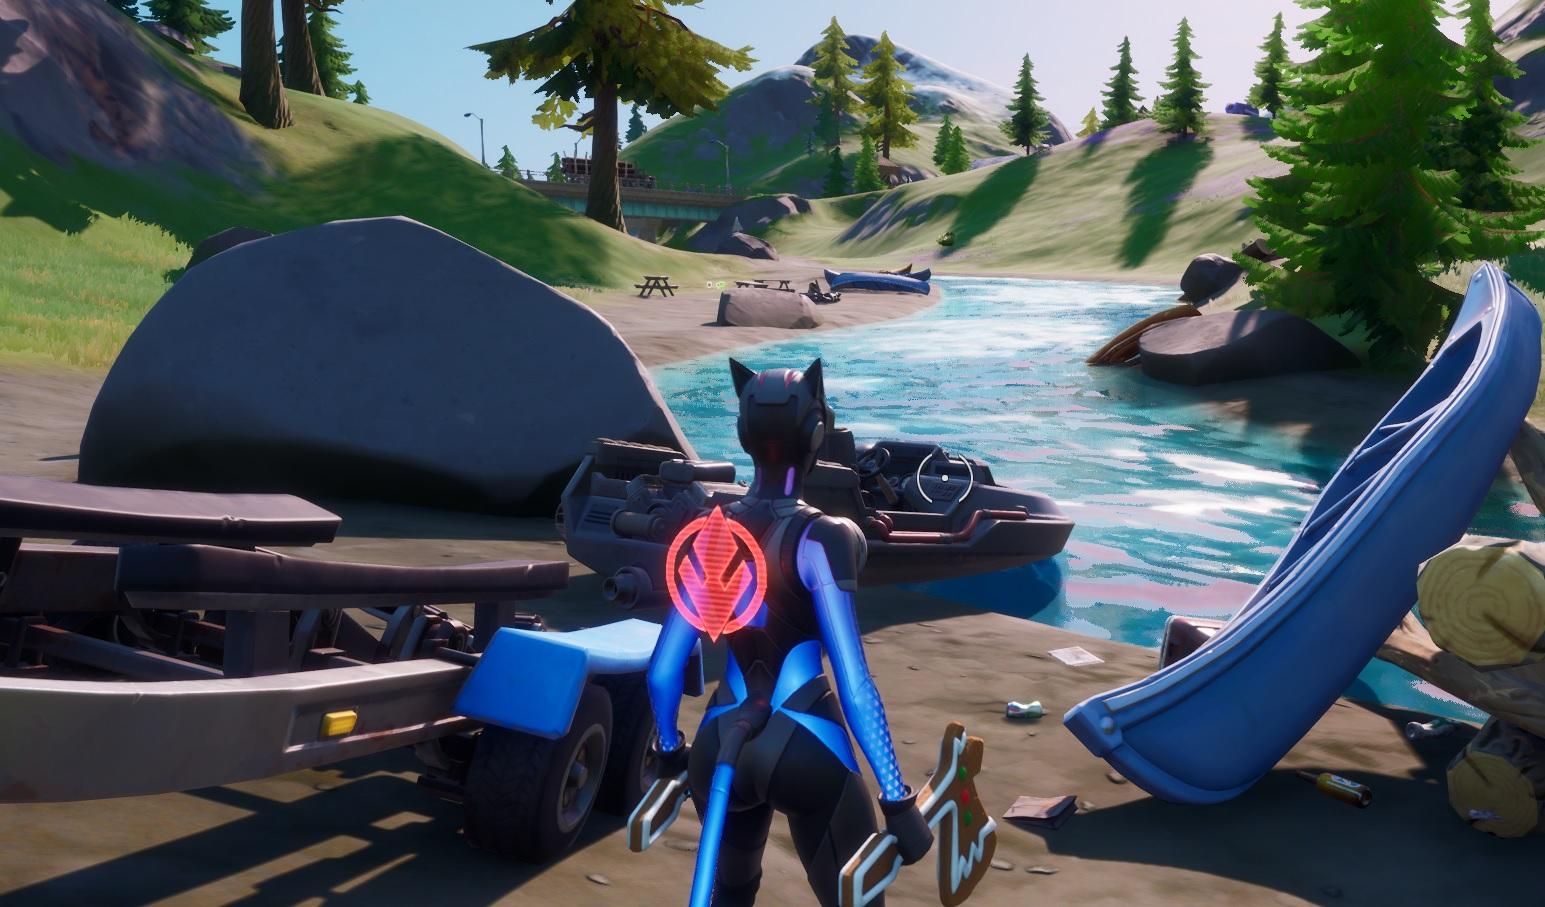 Fortnite: Temporada 2 - Visita The Shark, Rapid's Rest y Gorgeous Gorge 17